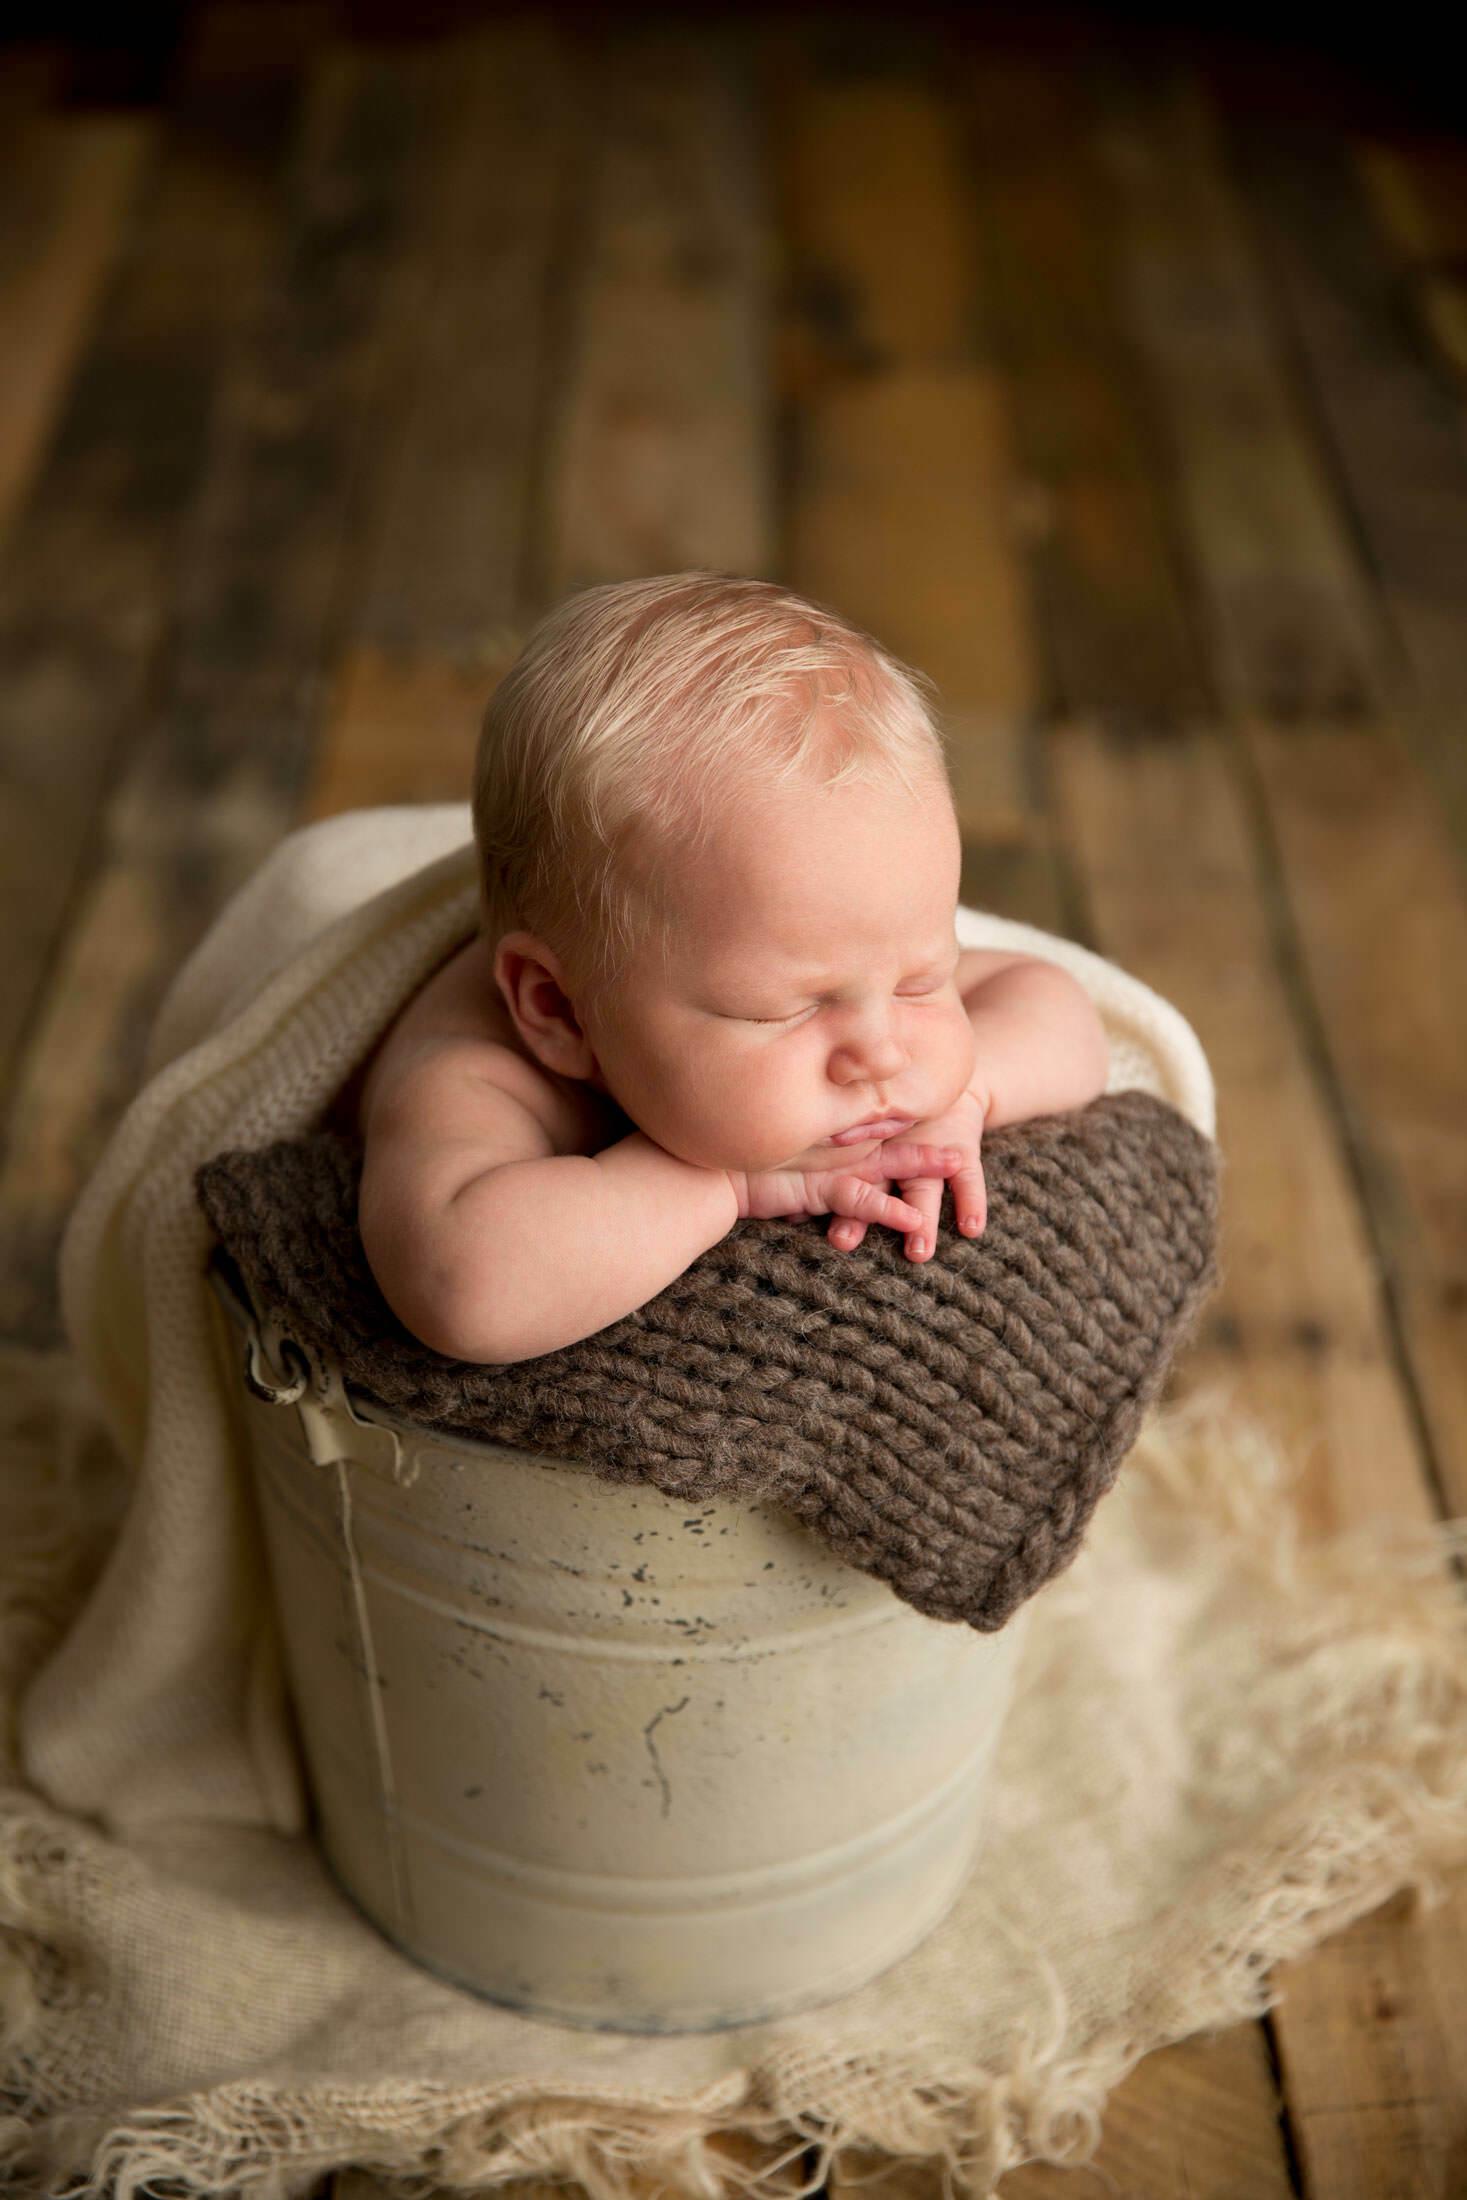 los angeles newborn photography bucket photo